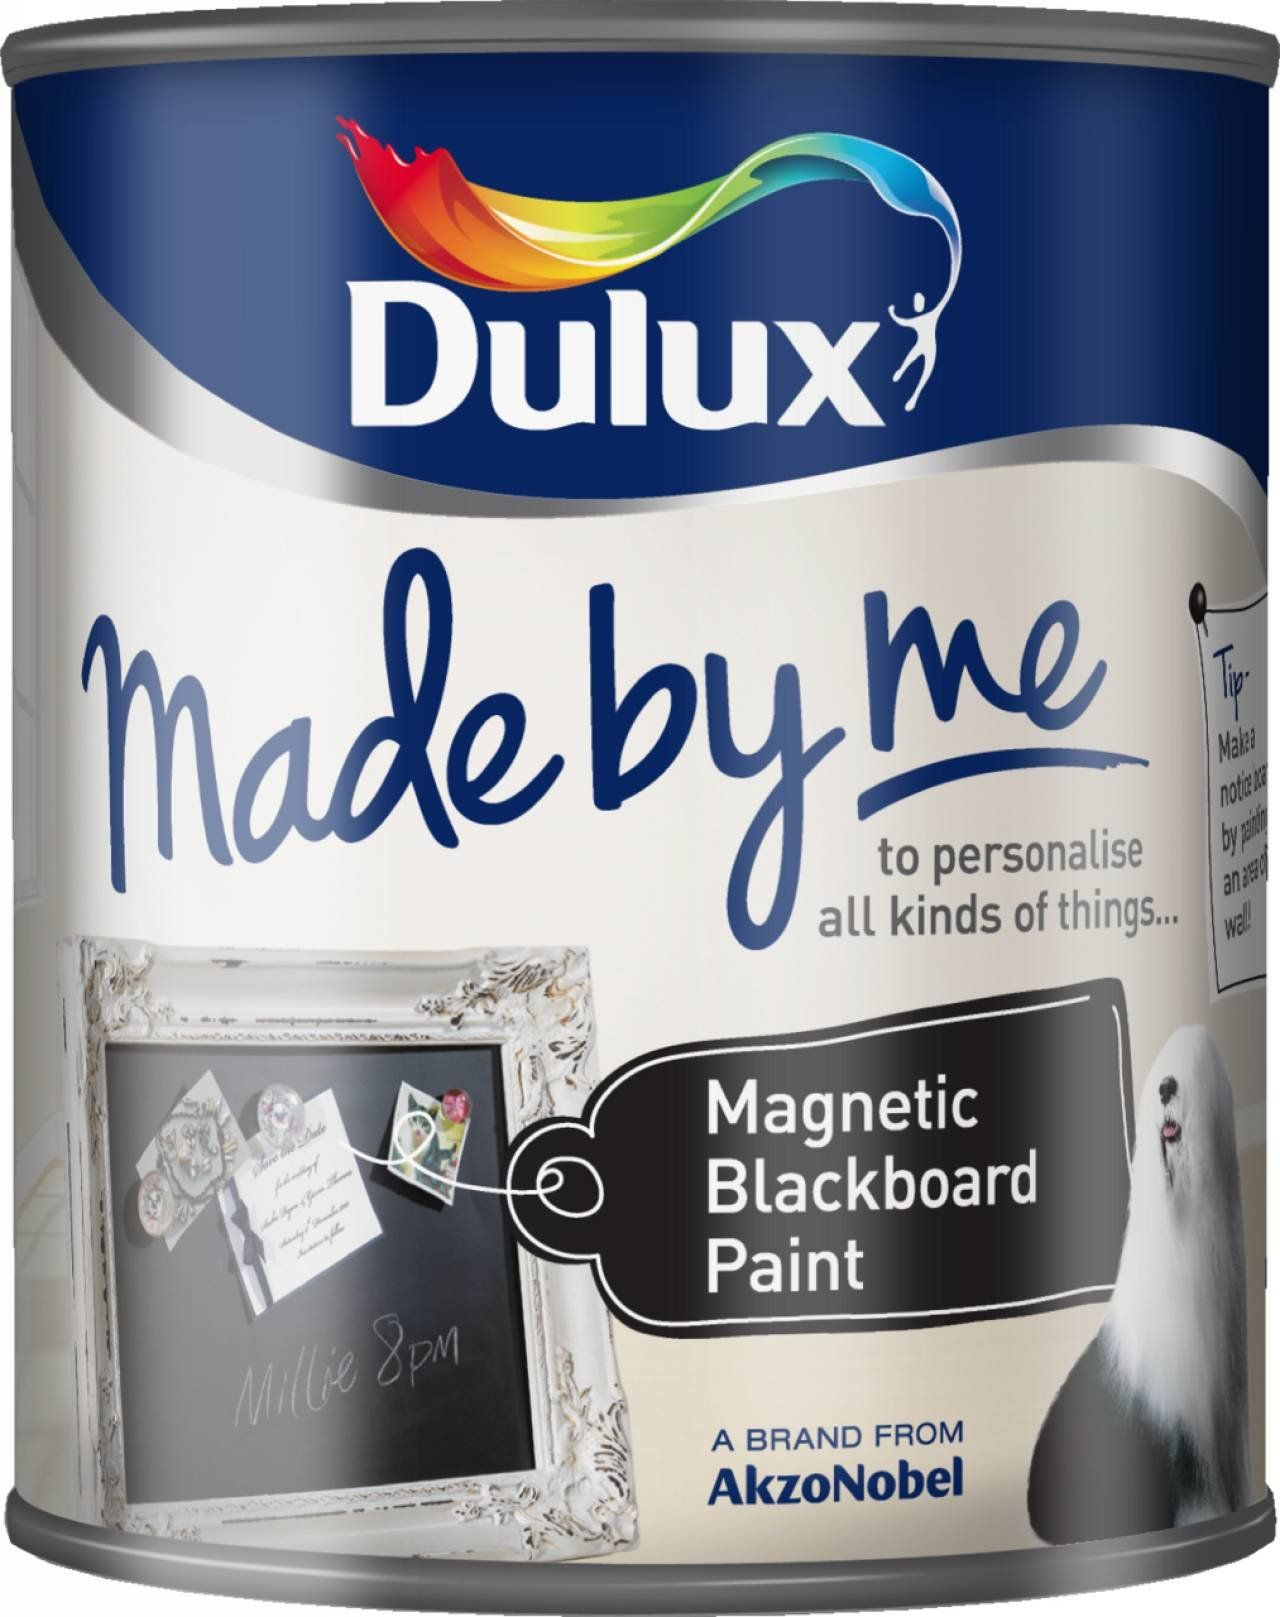 Dulux Made By Me Blackboard Paint 750ml Amazon